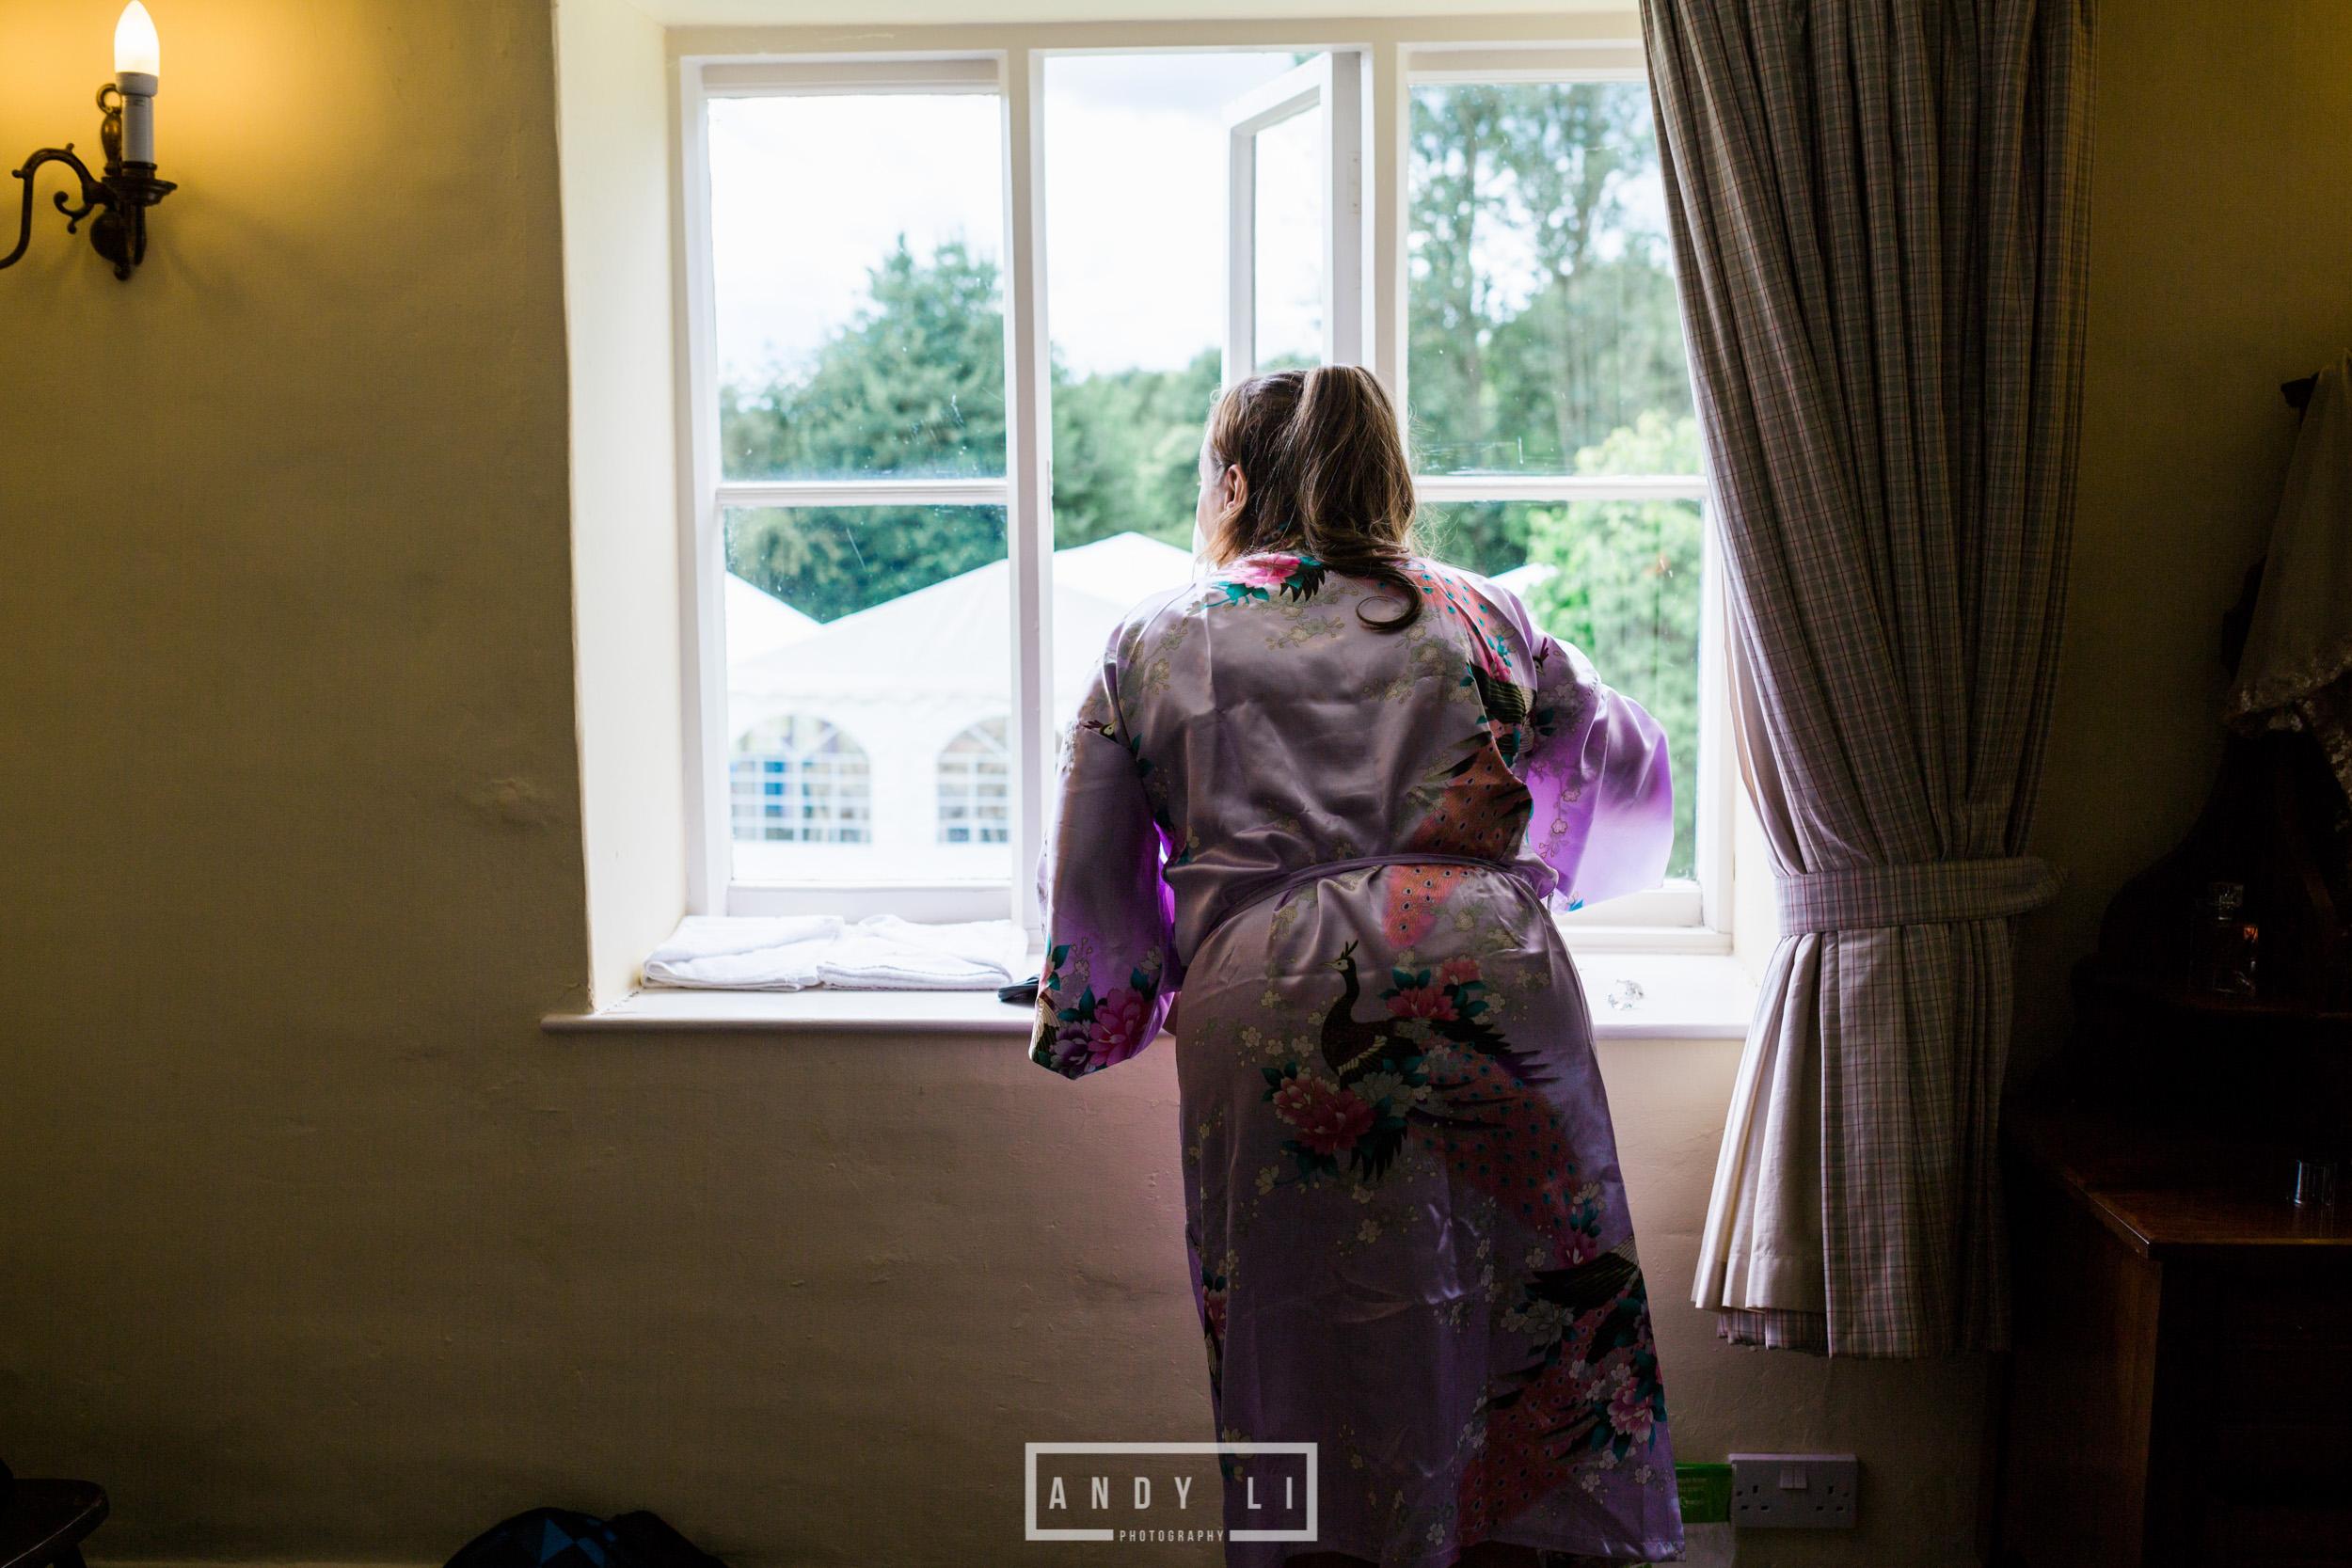 Festival Wedding Shropshire-Andy Li Photography-054.jpg